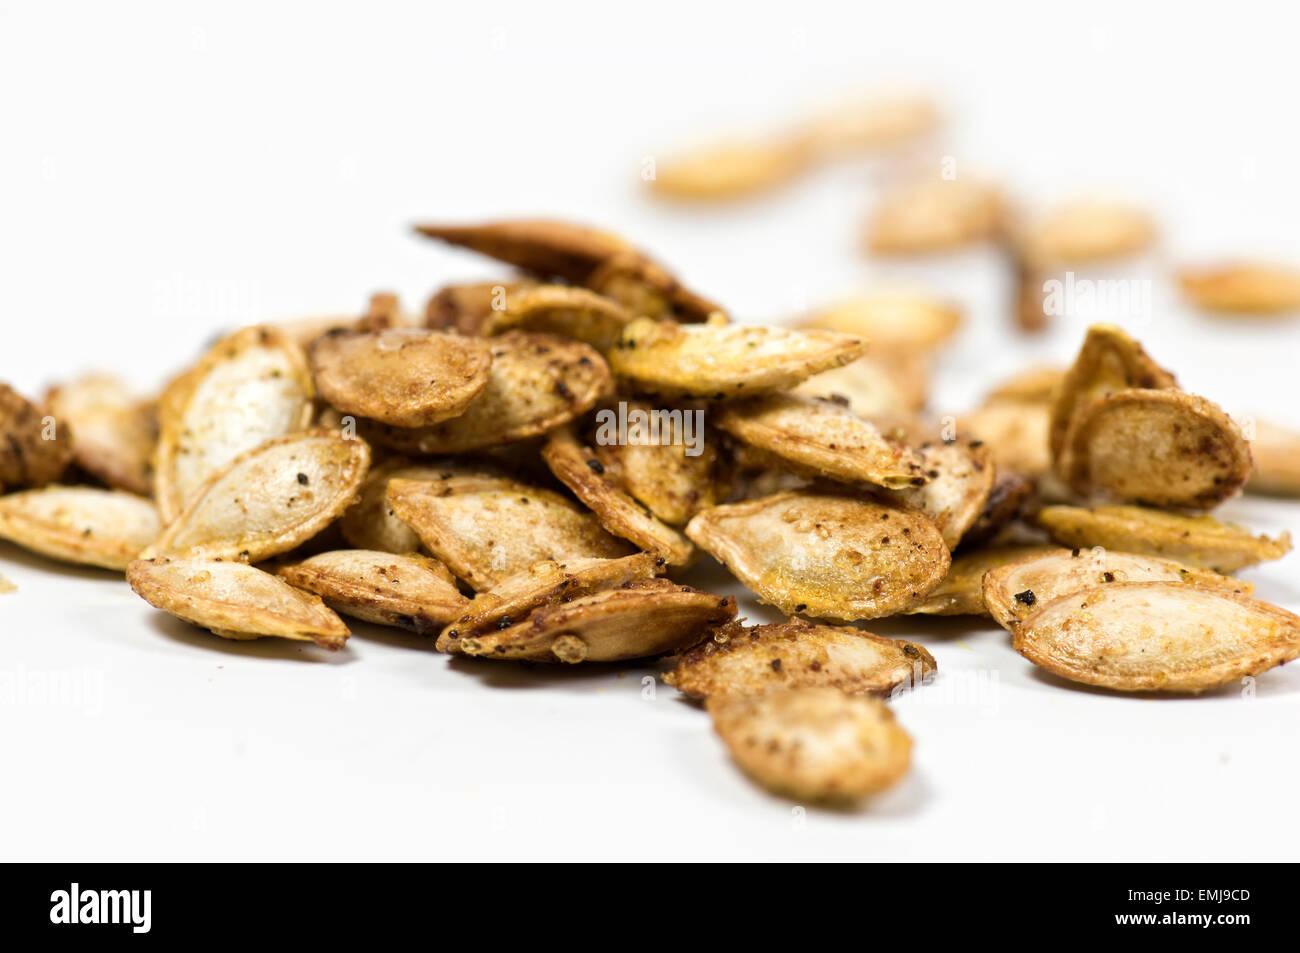 Calabacita asada semillas sobre fondo blanco. Imagen De Stock